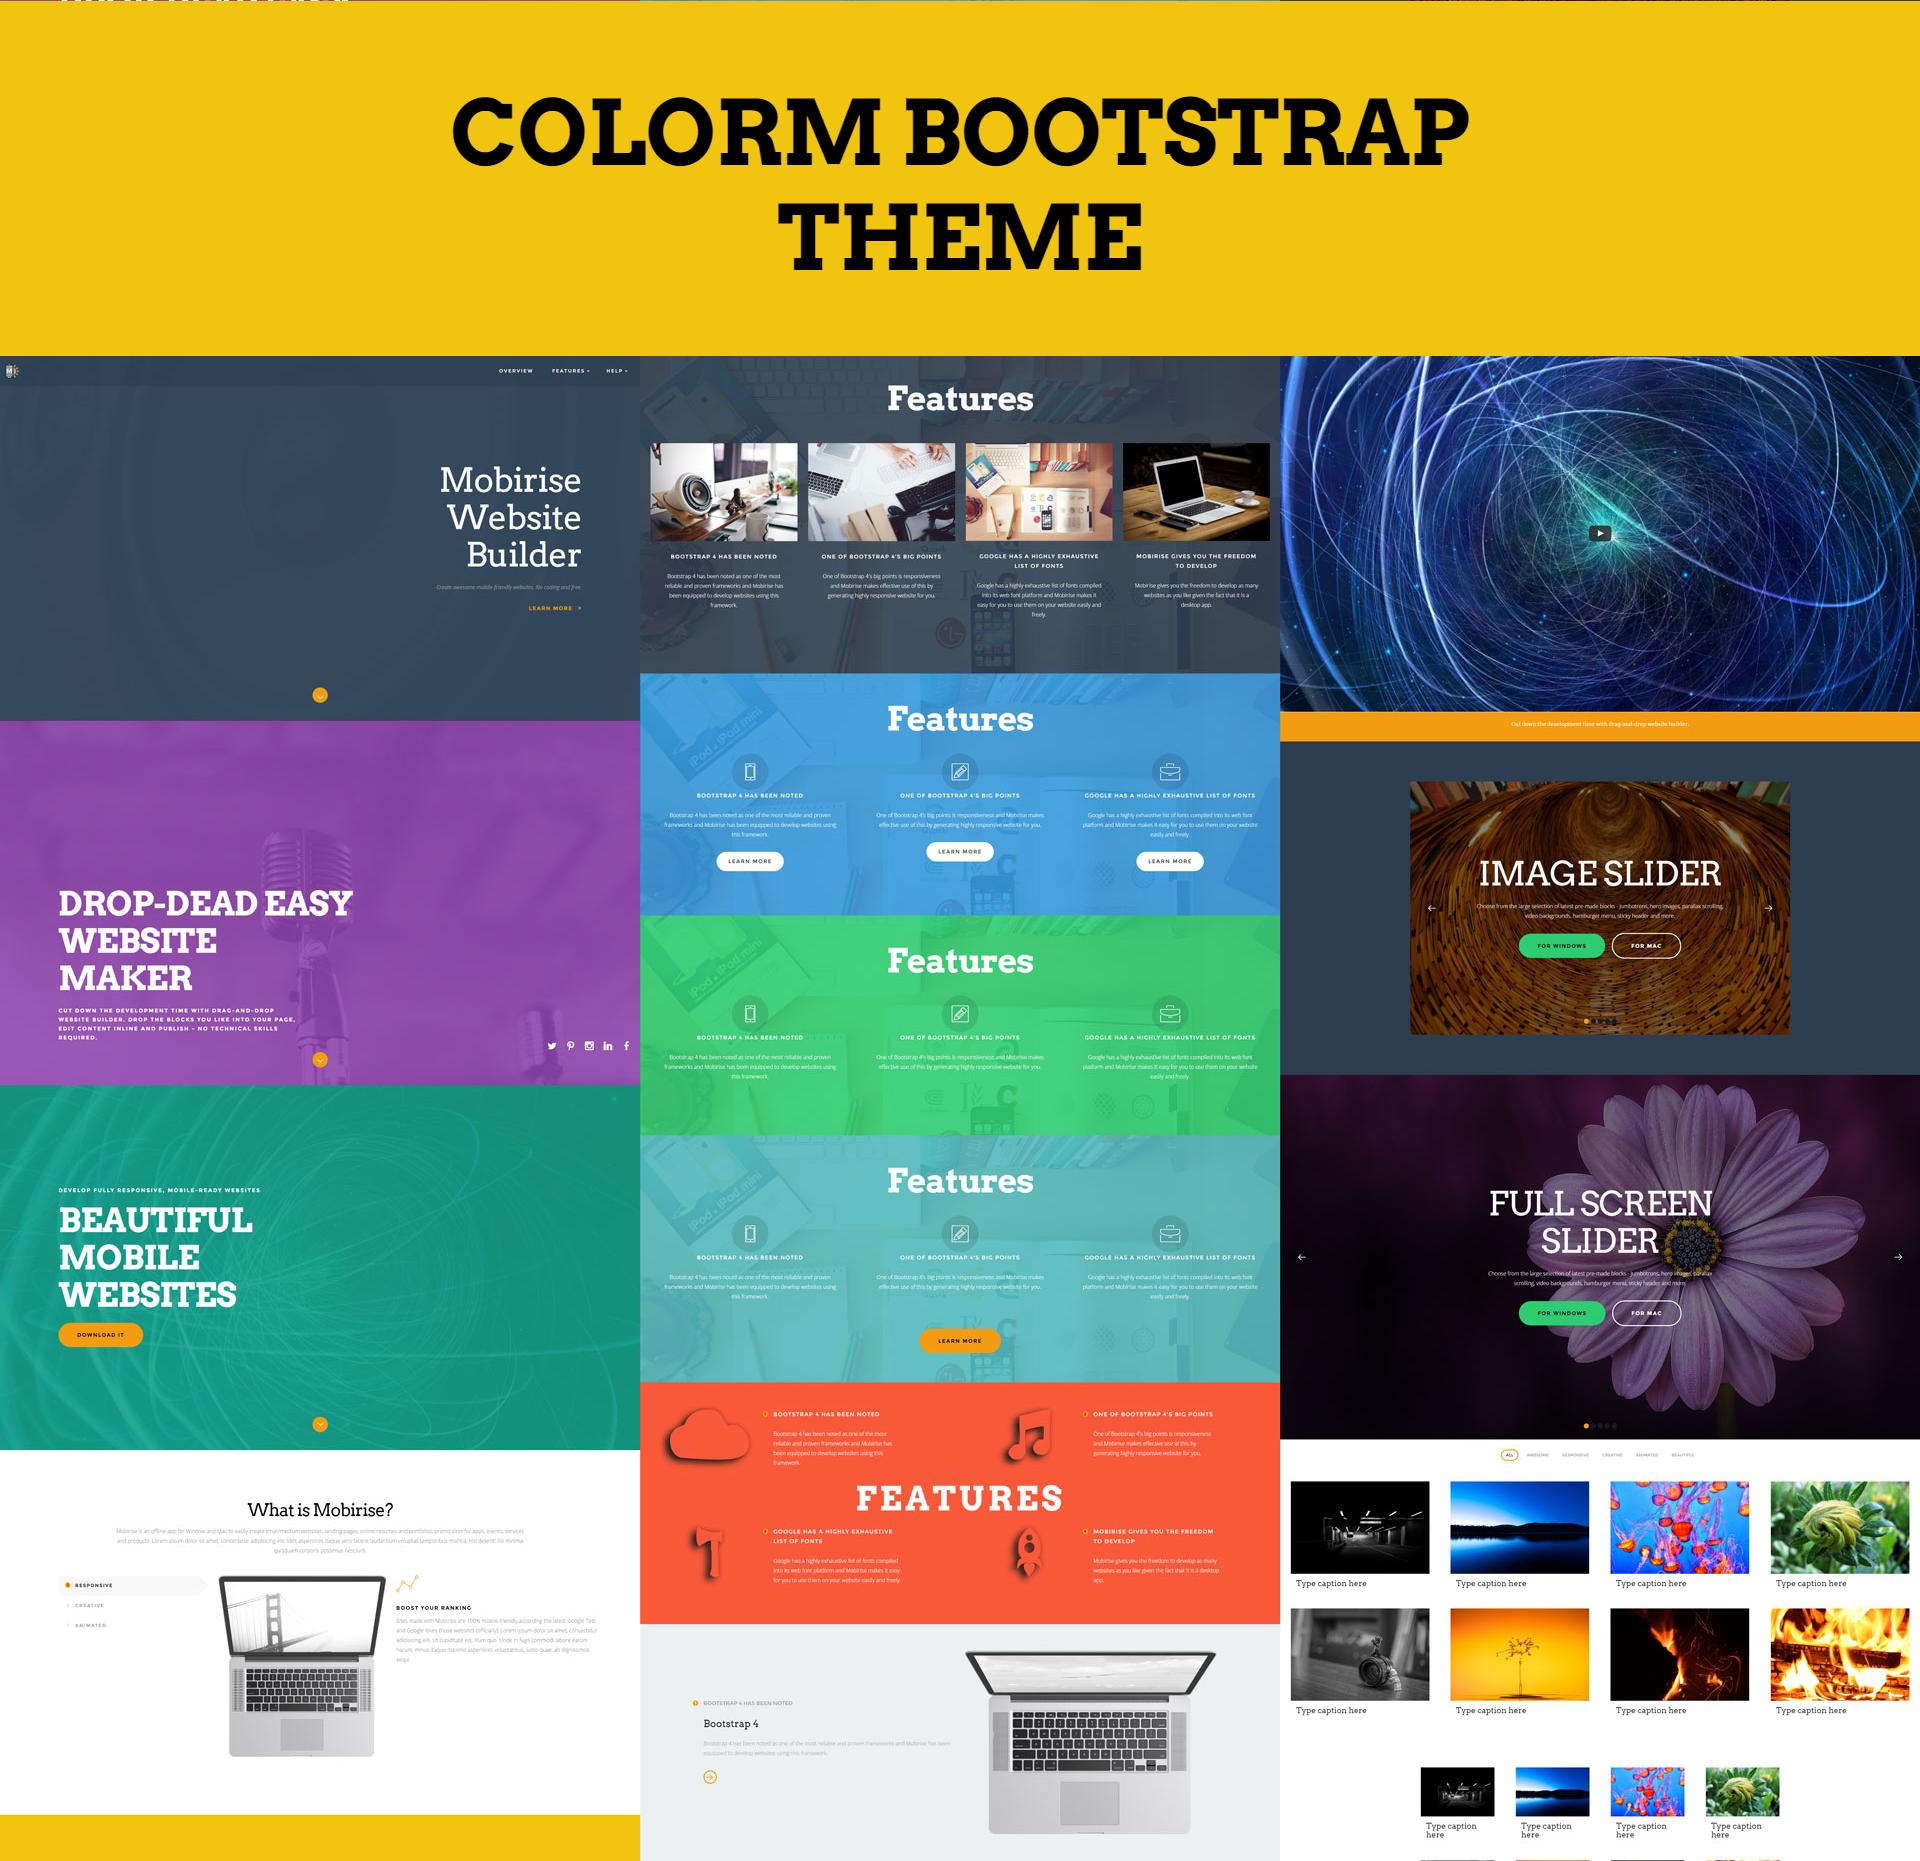 ColorM Bootstrap Theme